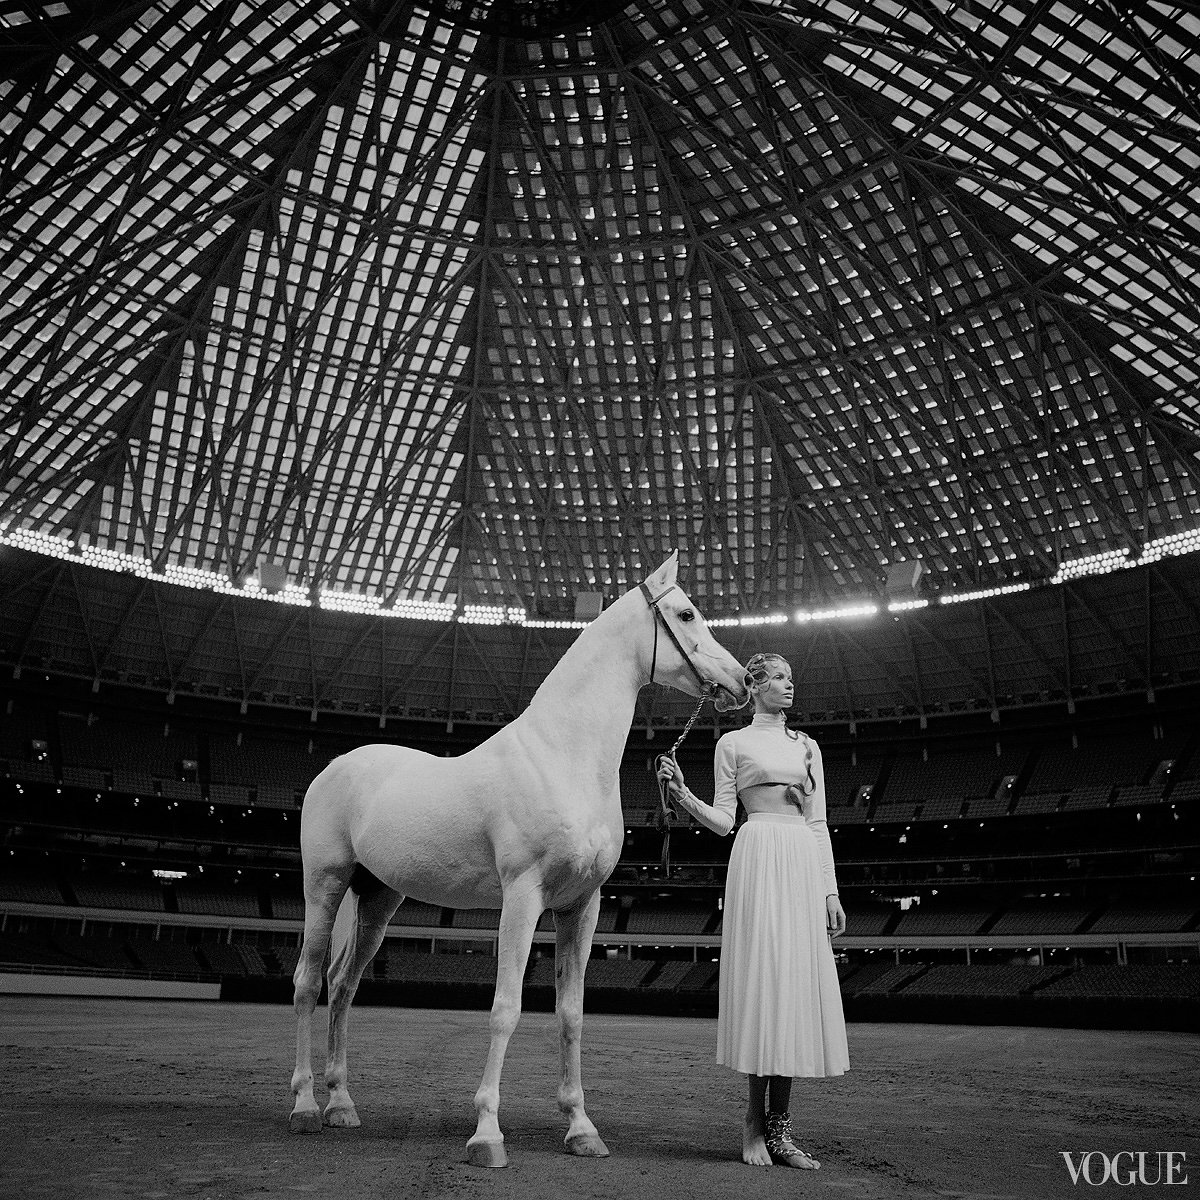 horses-in-vogue-06_153400652925